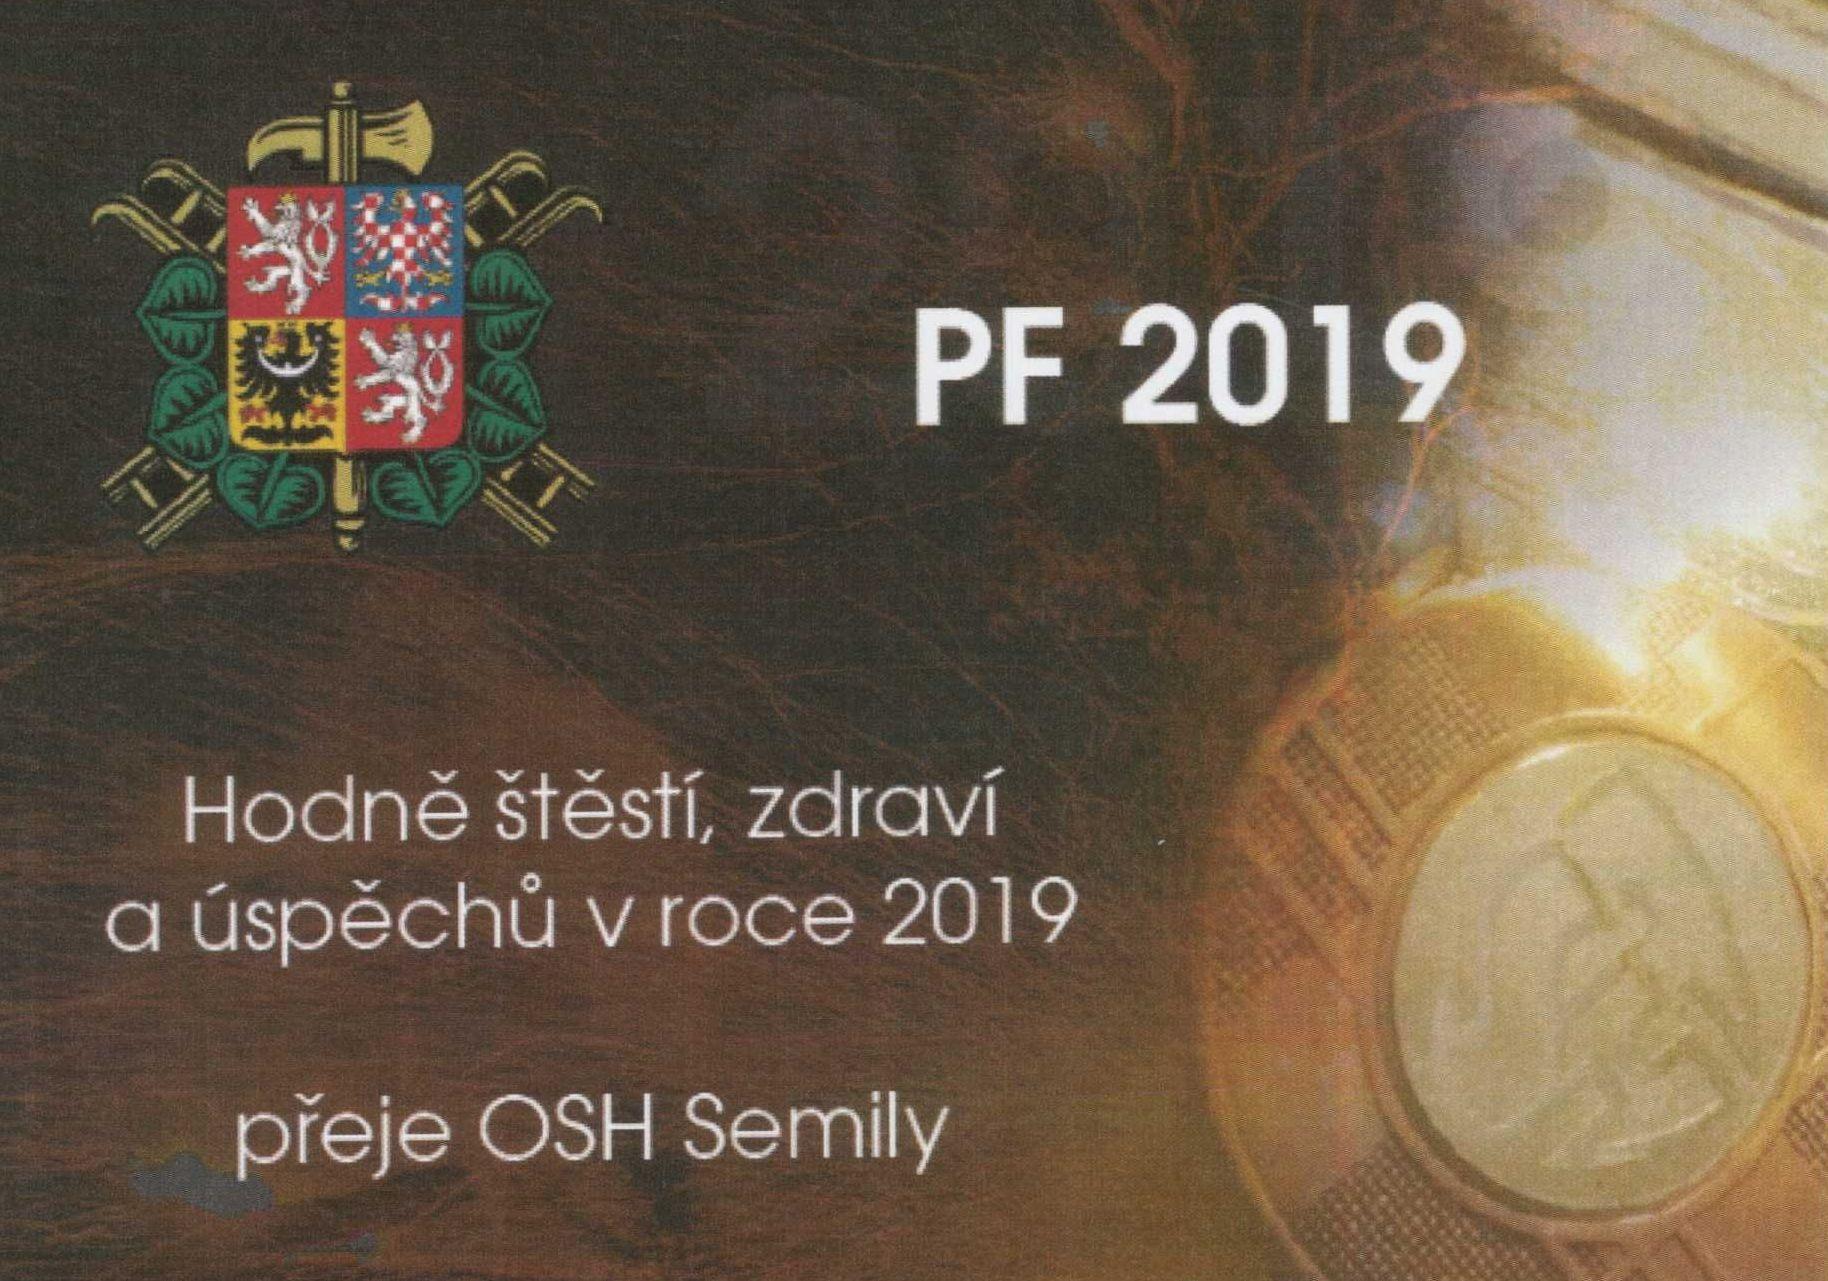 pf 2019 4